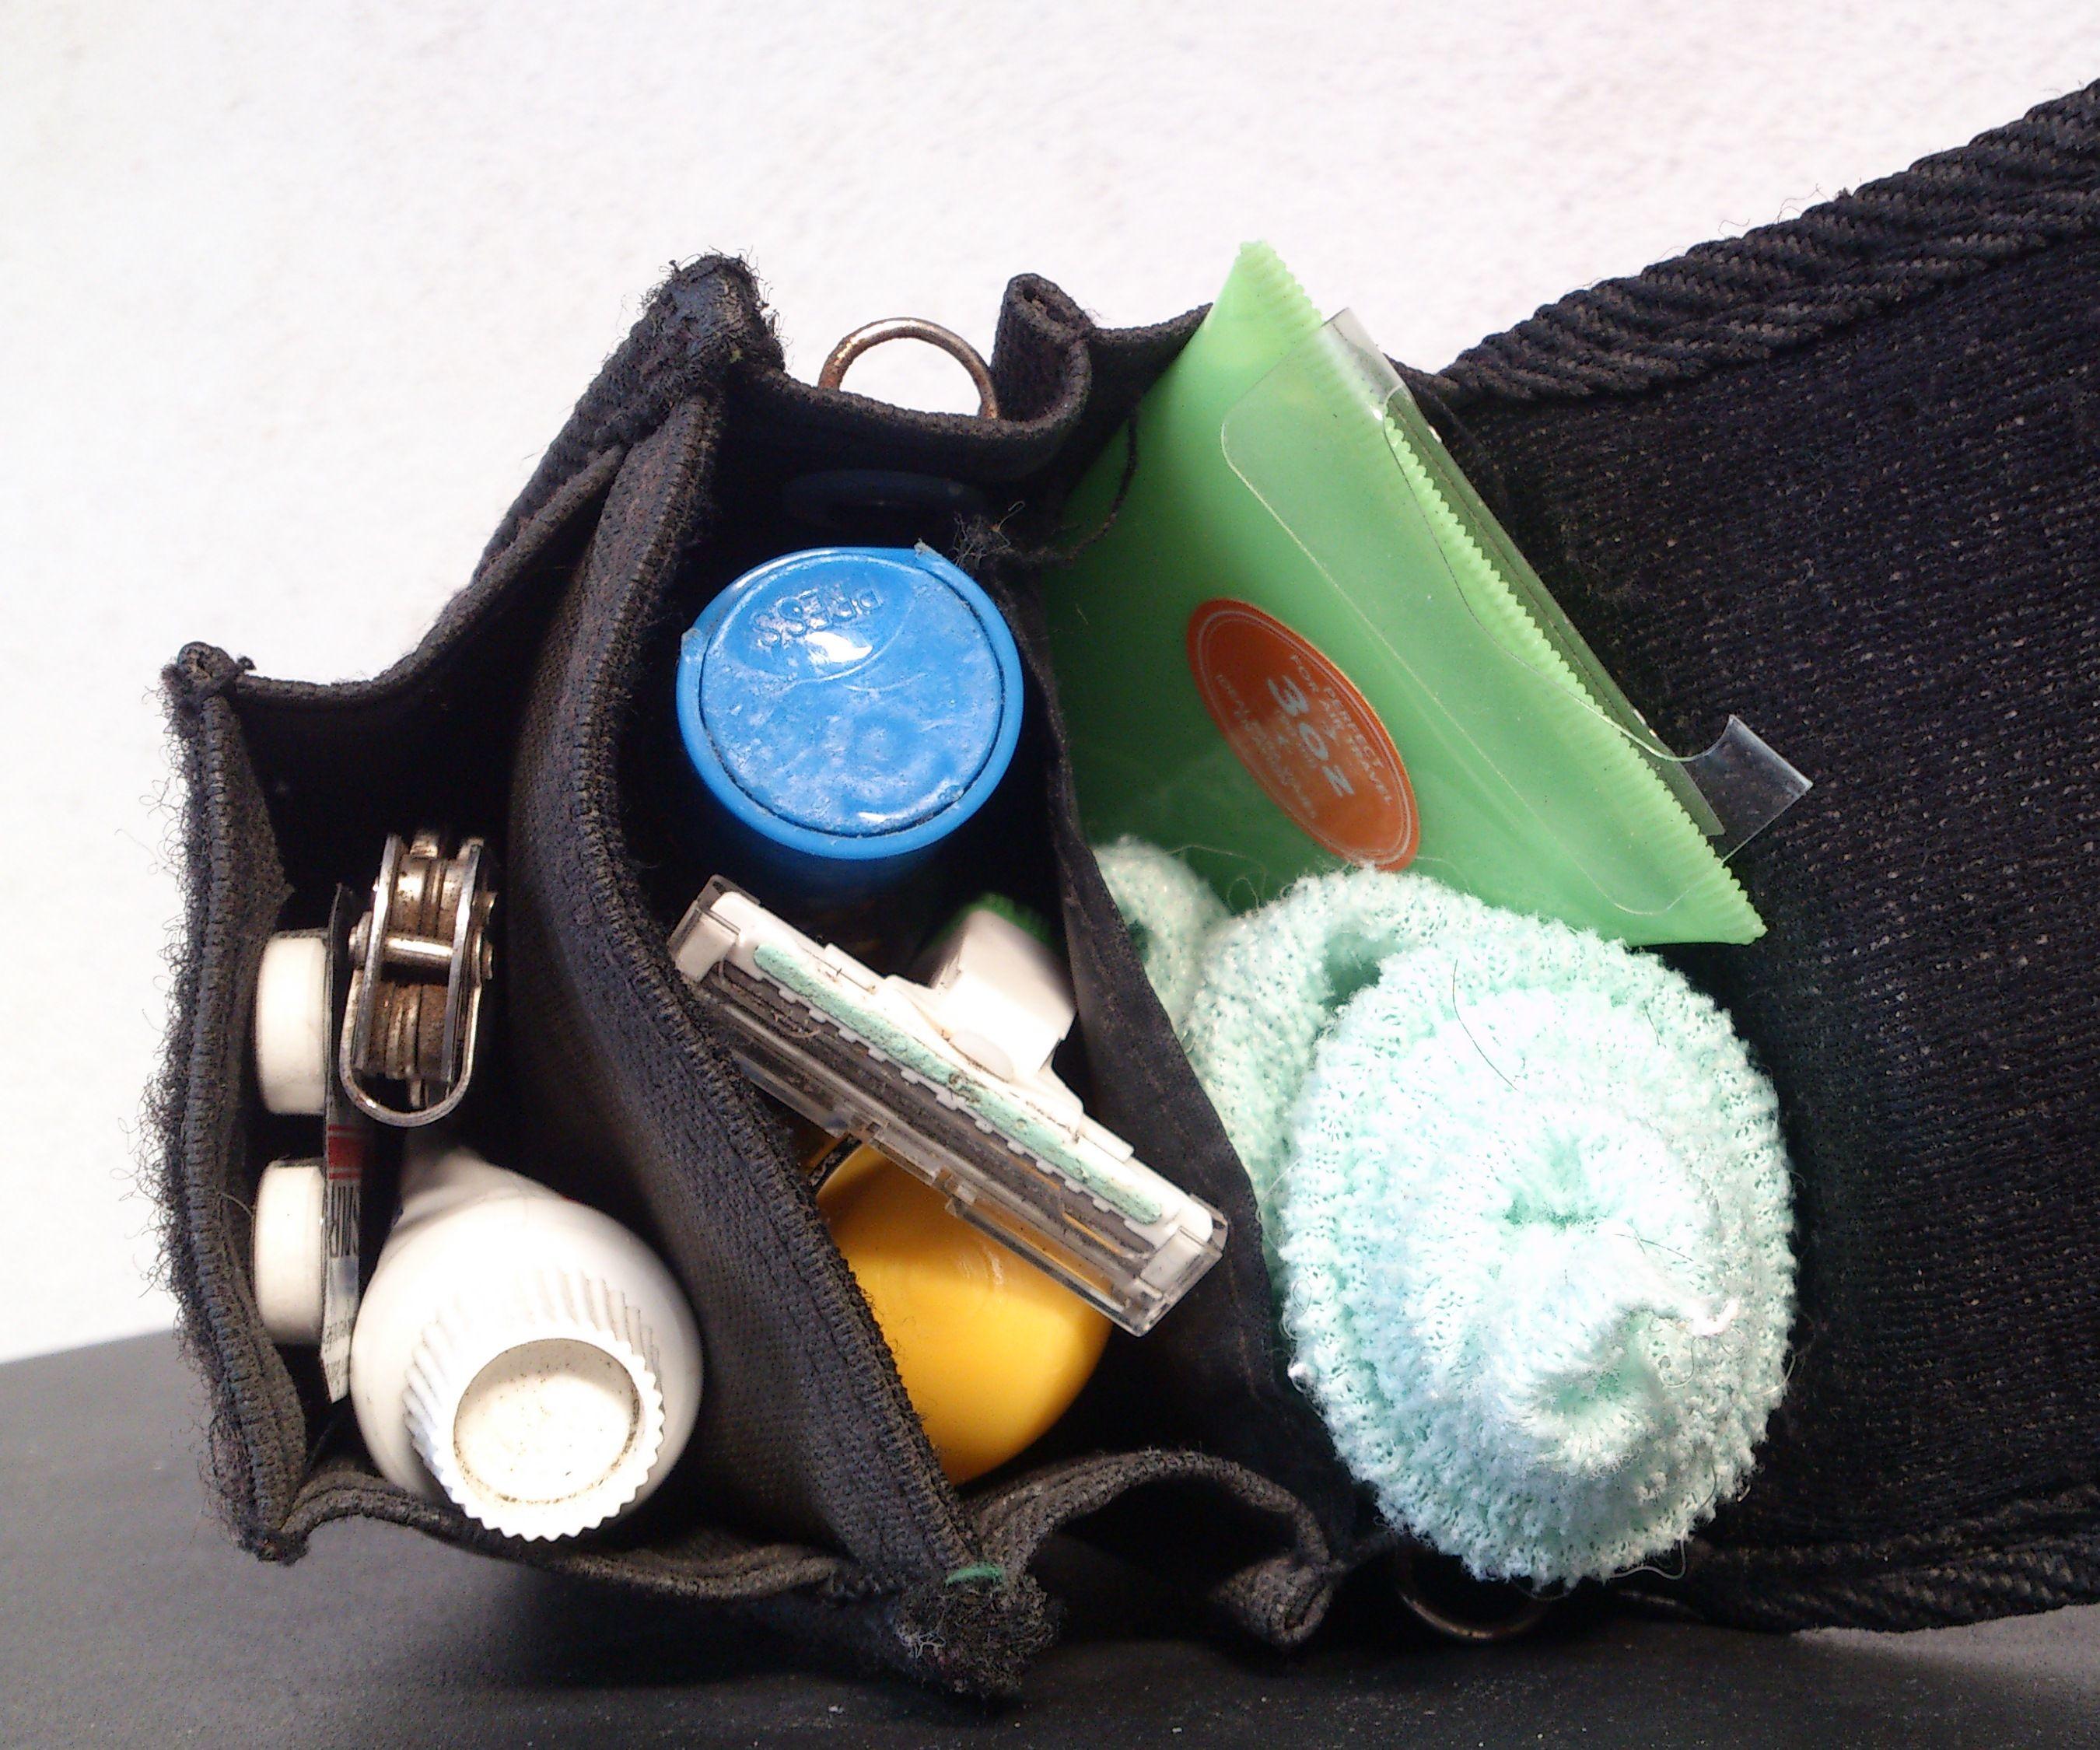 Pocket Size Travel Cleaning Kit